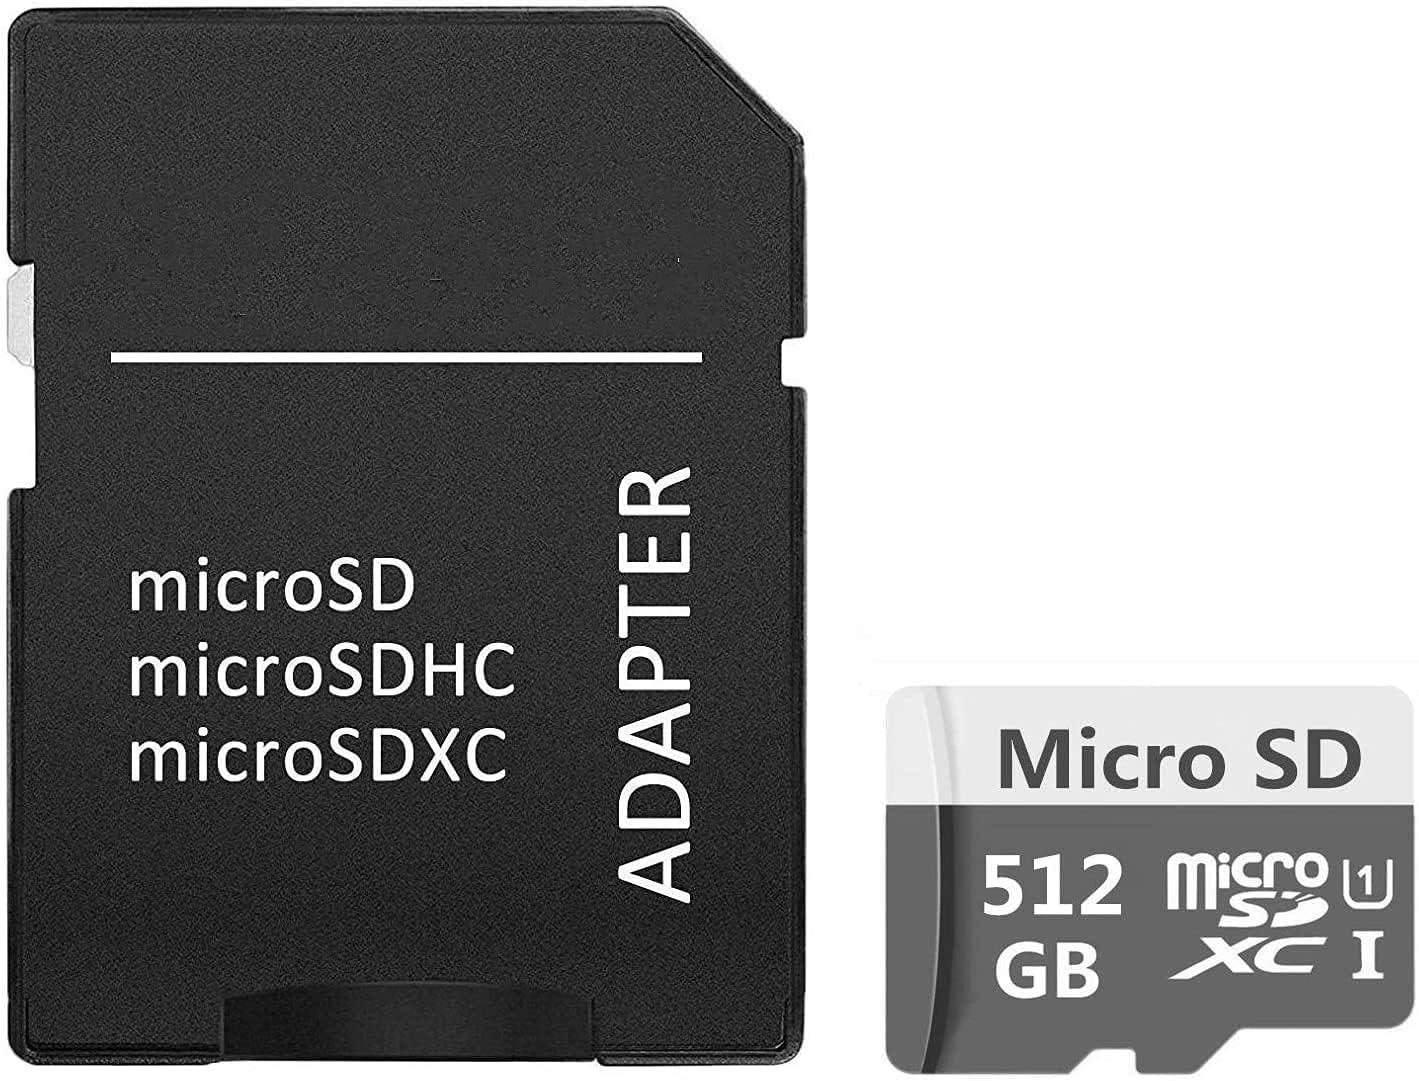 512GB Micro SD Card Ultra Micro SDXC UHS-I Memory Card 512GB High Speed Class 10 TF Card with SD Adapter (512GB-C)